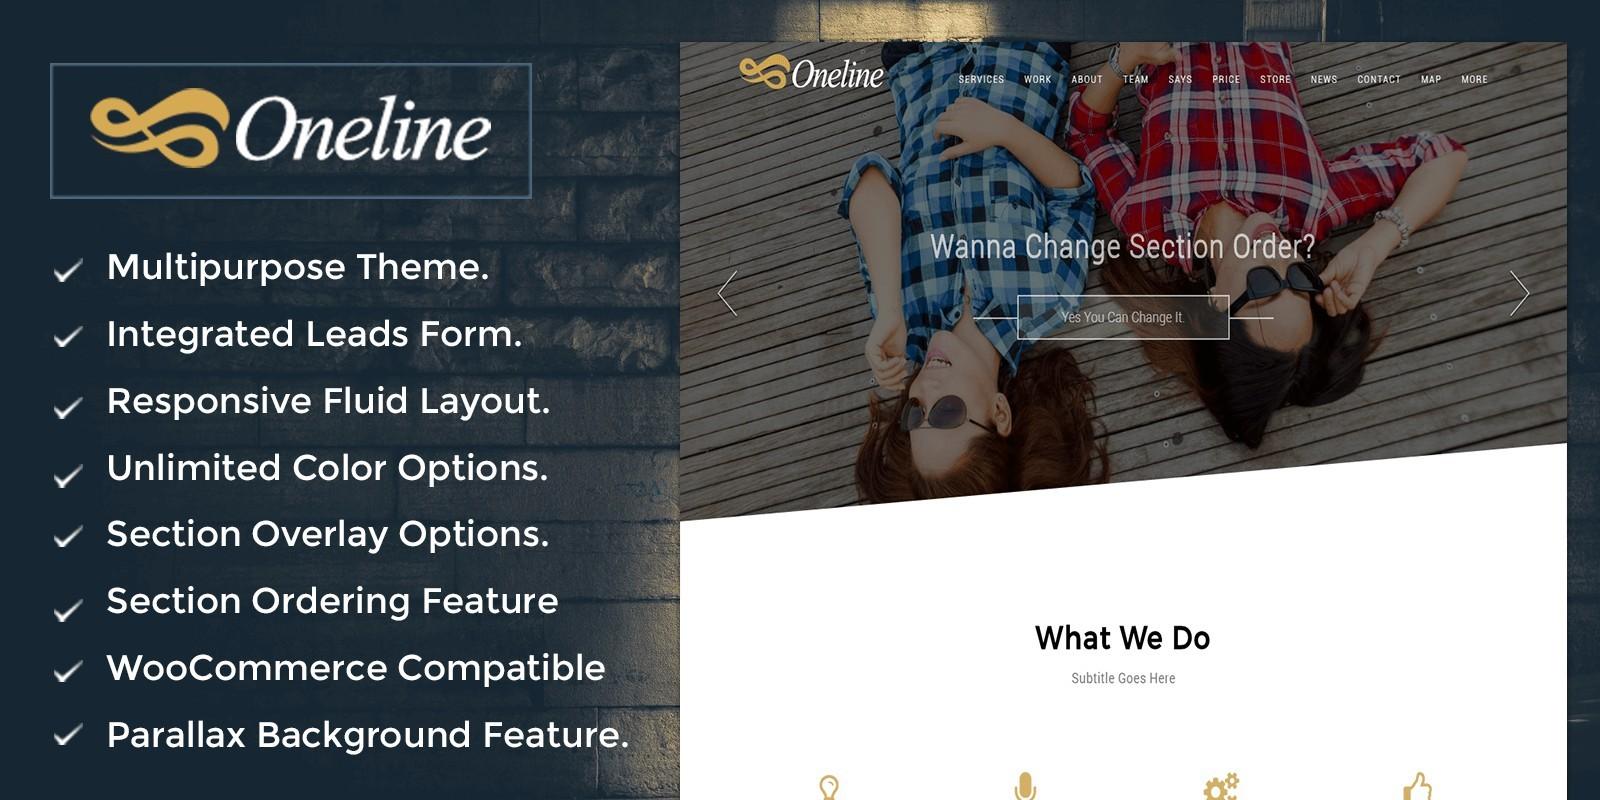 OneLine – Multipurpose WordPress Theme